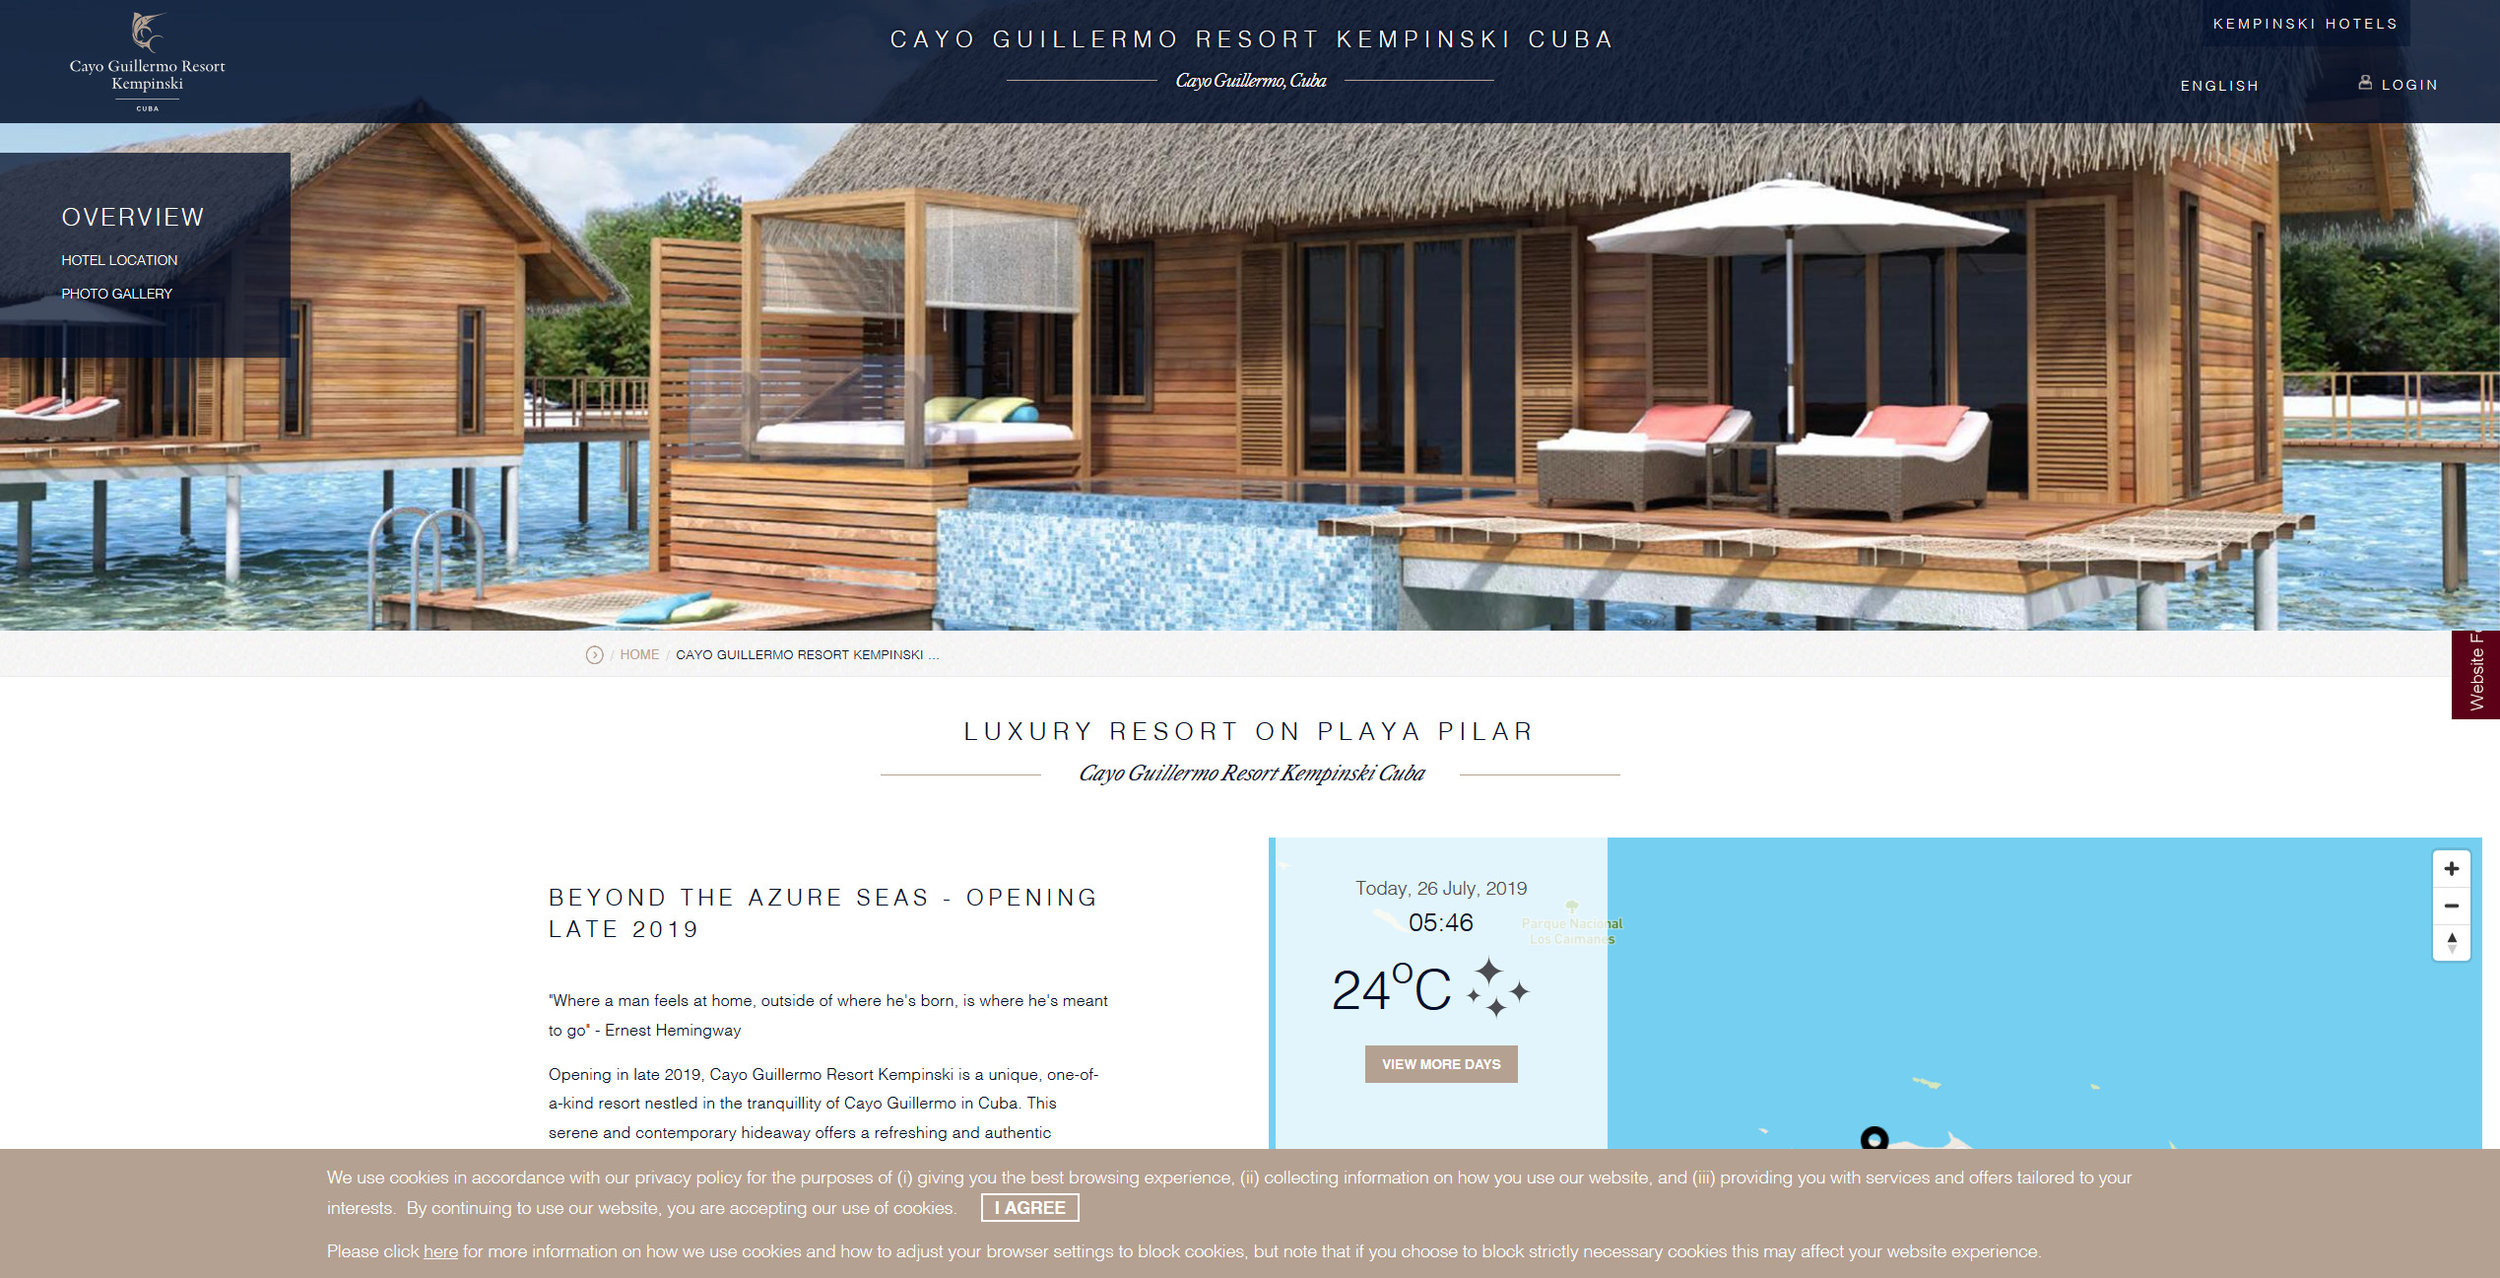 Screenshot_2019-07-26 5-Star Luxury Resort in Cuba Cayo Guillermo Resort Kempinski Cuba.jpg